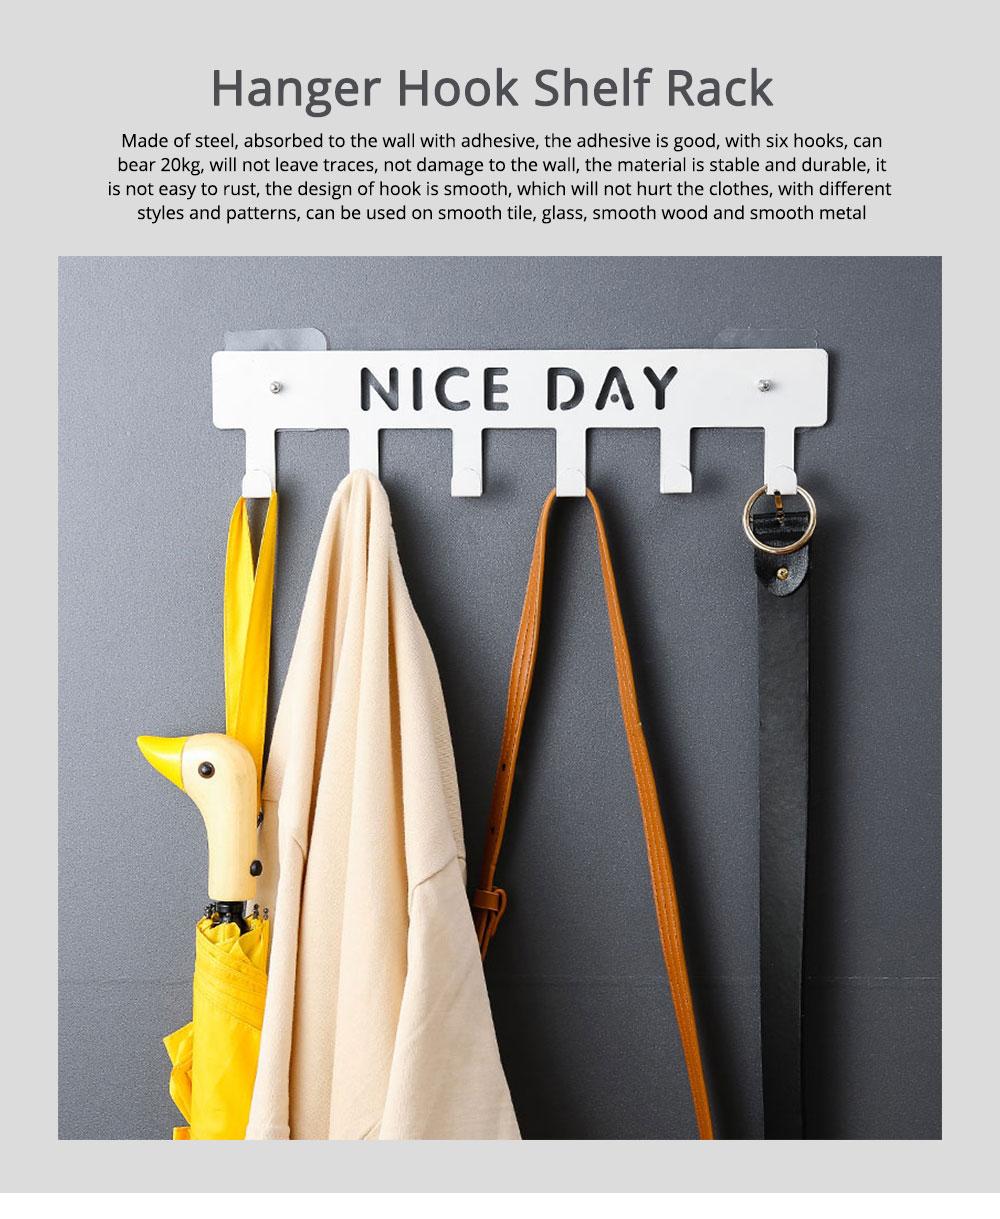 Hook and Bath Decorative Multi Back Door Over The Door Hanger, Cloth Hook Shelf Rack, Seamless Nail-free 0